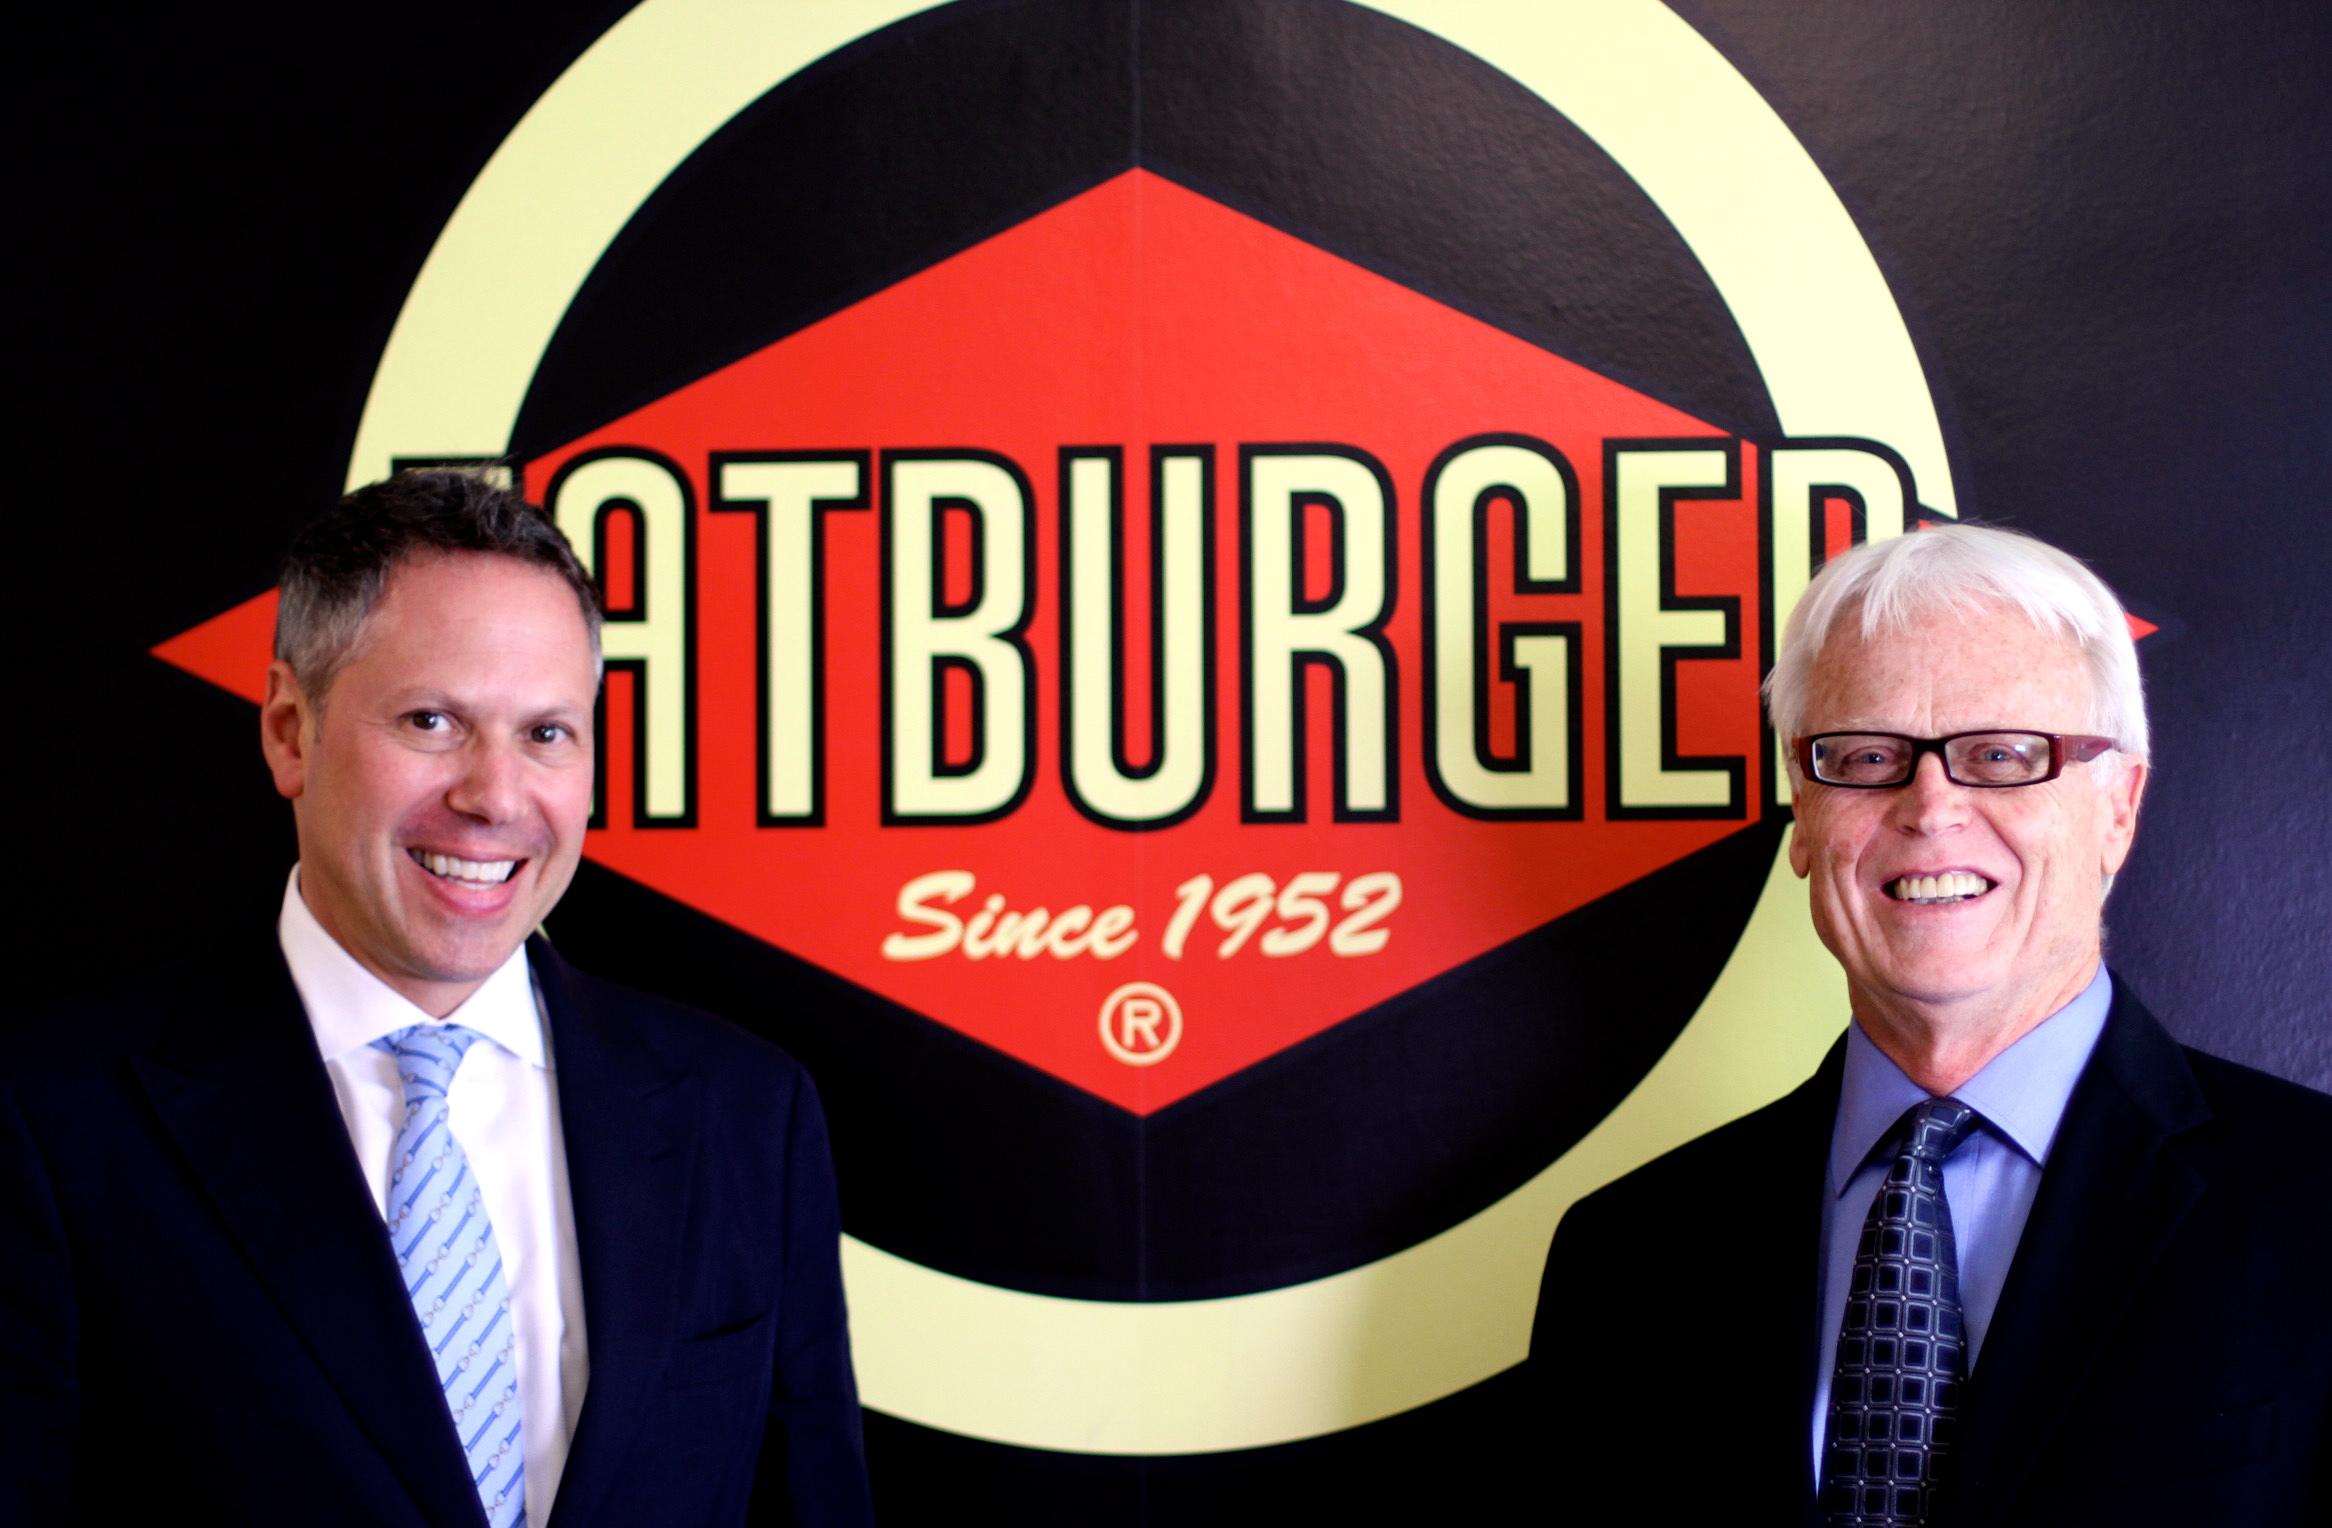 CEO Andrew Wiederhorn & President Don Berchtold